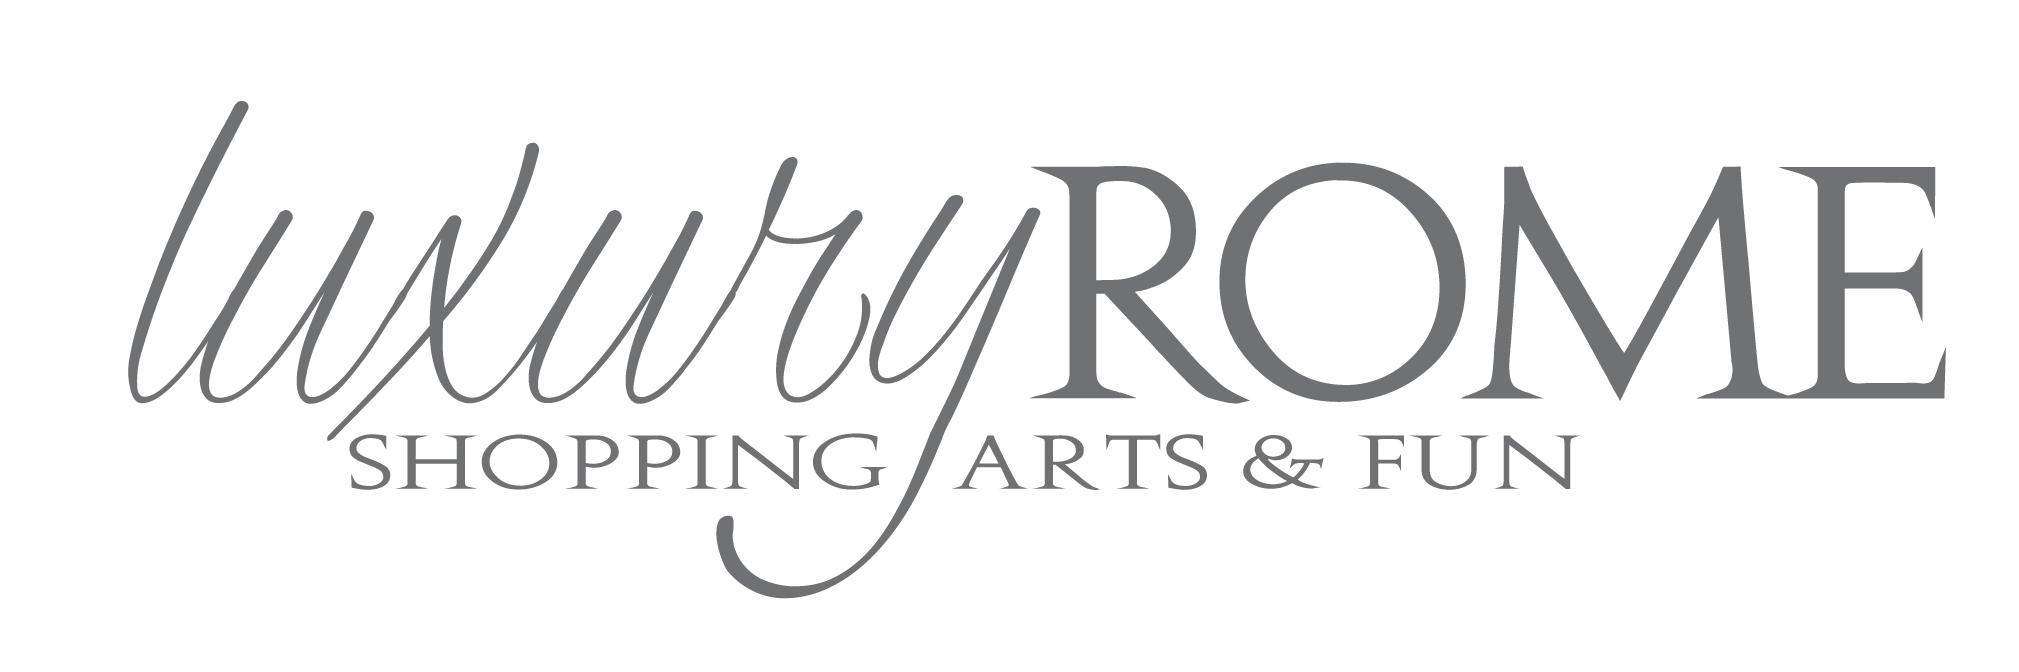 LuxuryRome – shopping, arts & fun